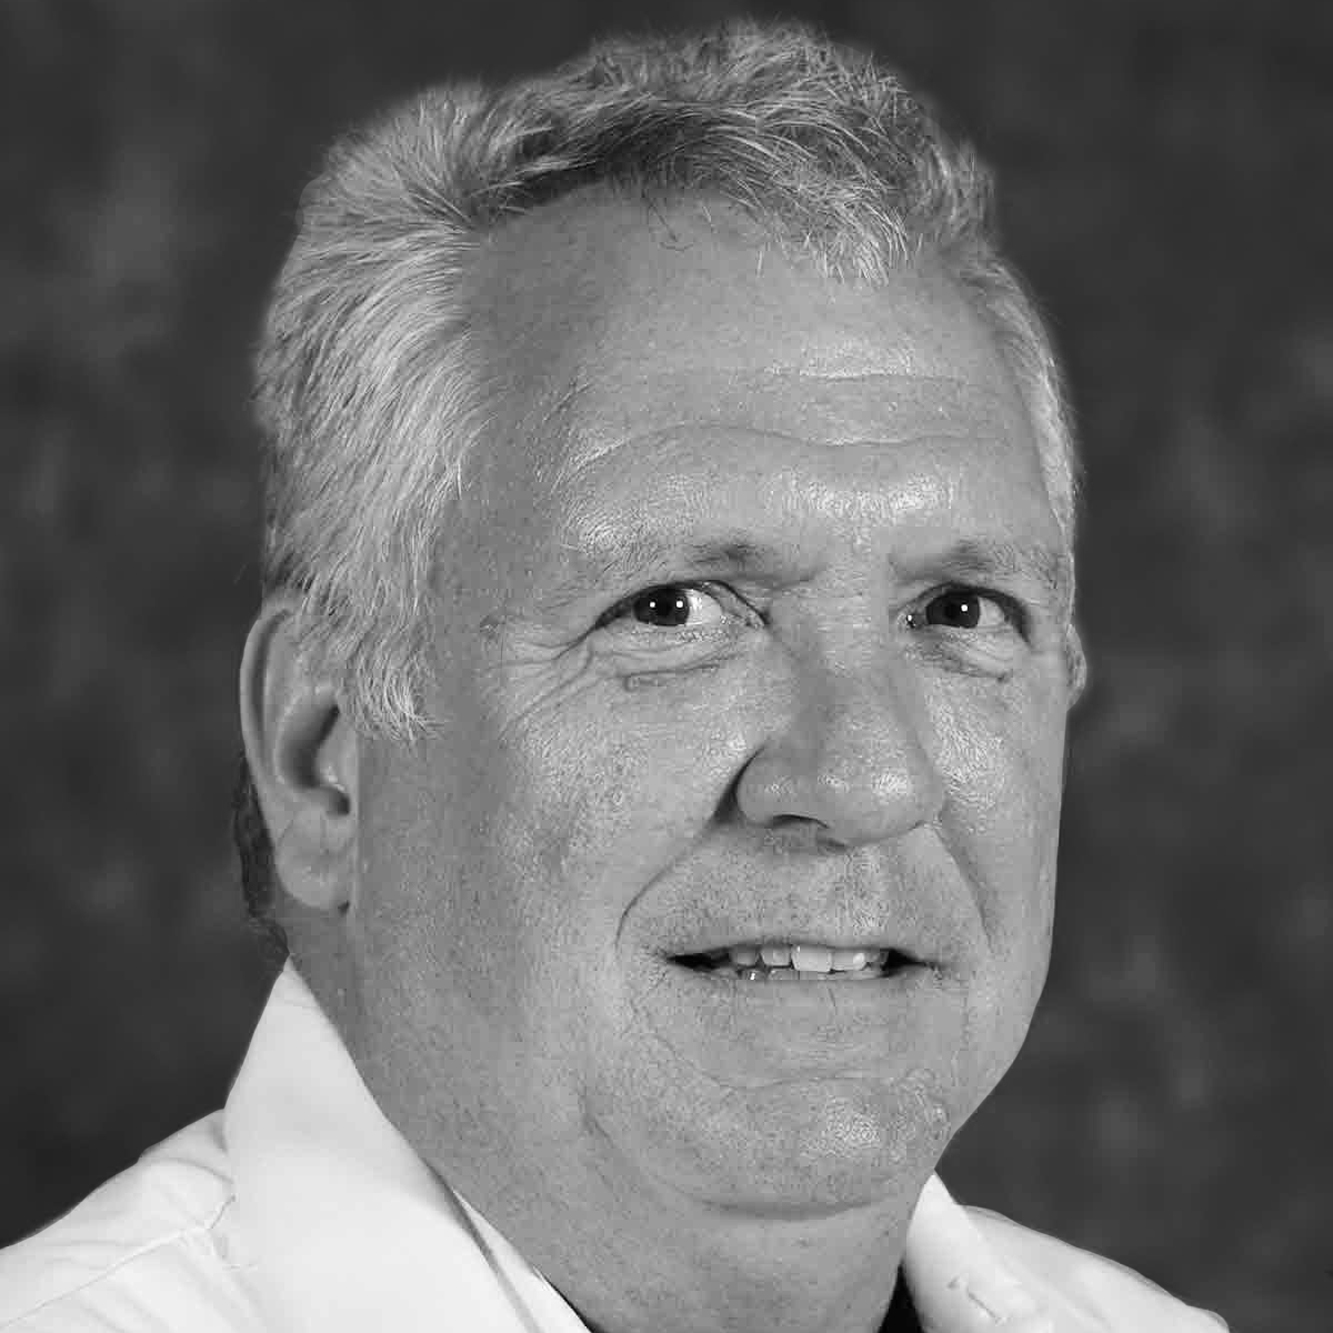 KCU Researcher Dr. Jeff Staudinger